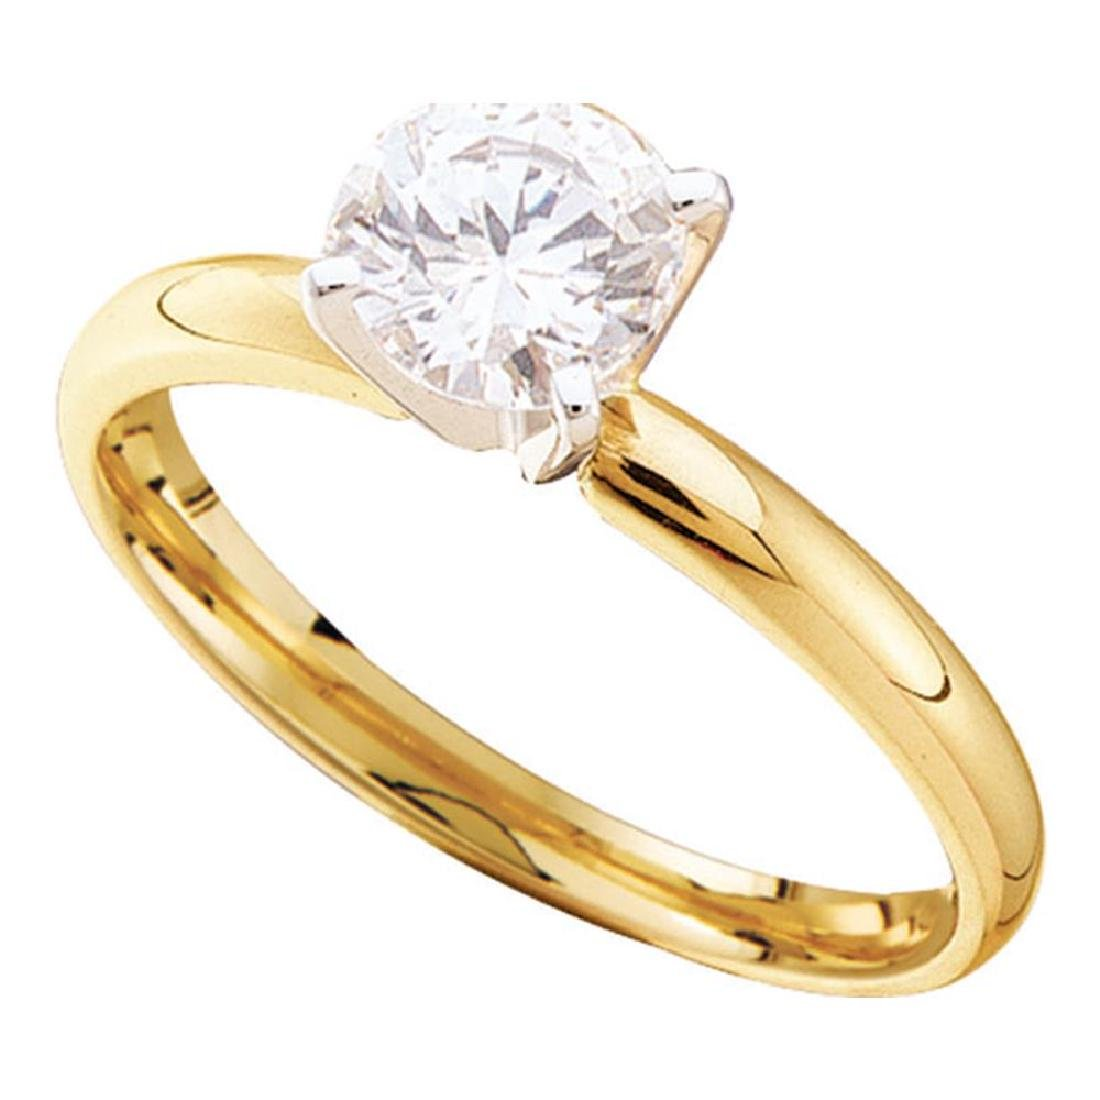 0.20 CTW Diamond Solitaire Bridal Engagement Ring 14KT